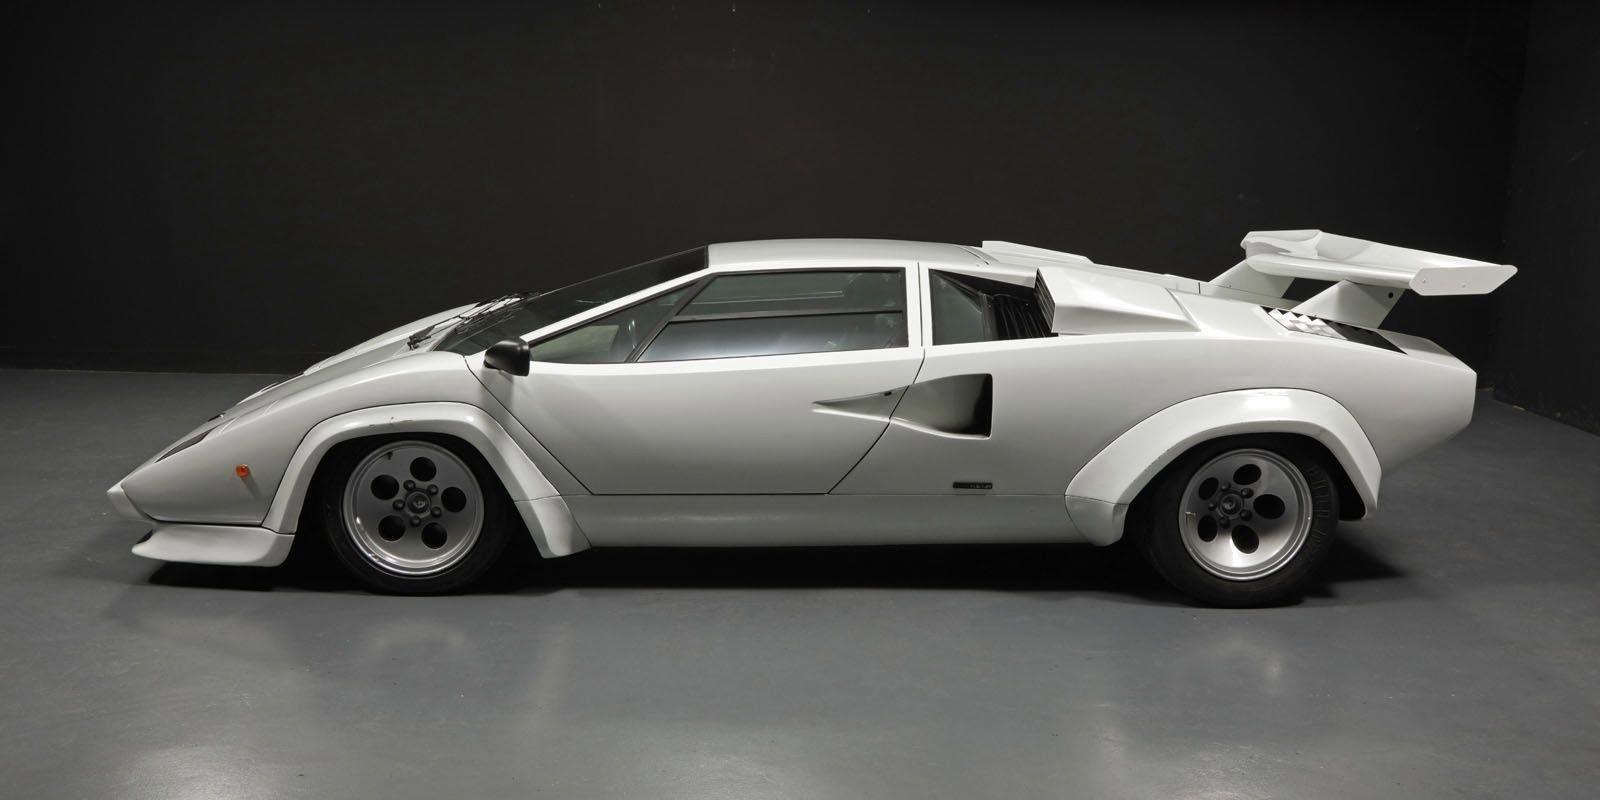 1980 Lamborghini Countach - LP400S #Lamborghiniclassiccars   Lamborghini countach. Classic cars. Lamborghini